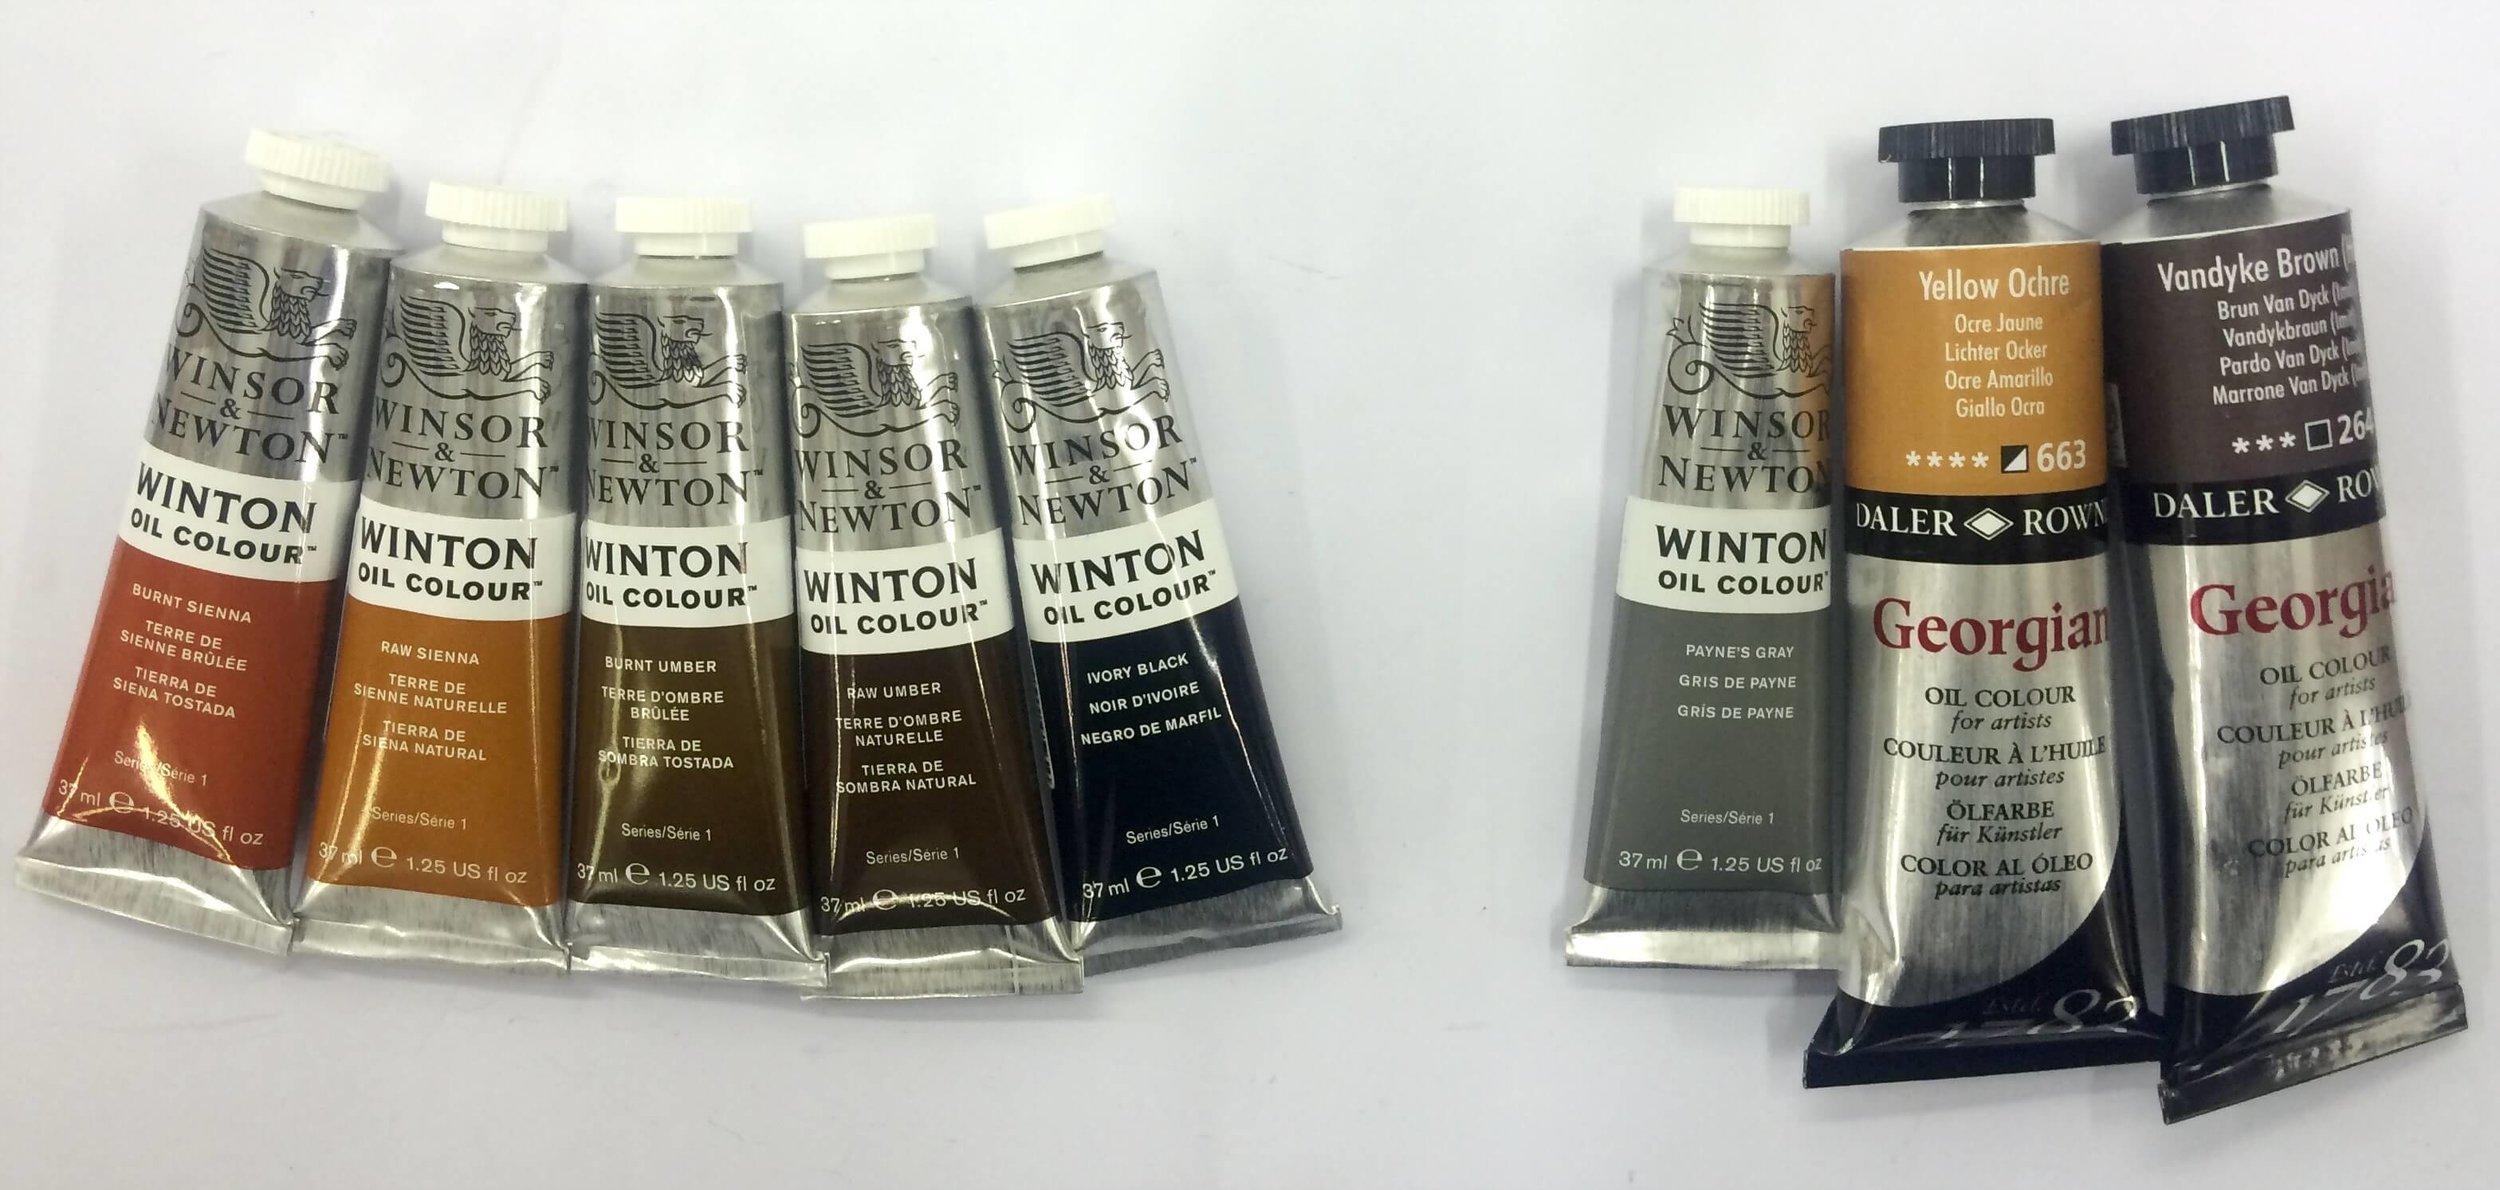 Winsor and Newton: Burnt Sienna, Raw Sienna, Burnt Umber, Raw Umber, Ivory Black | Extra: Payne's Grey, Yellow Ochre (Transparent), Vandyke Brown